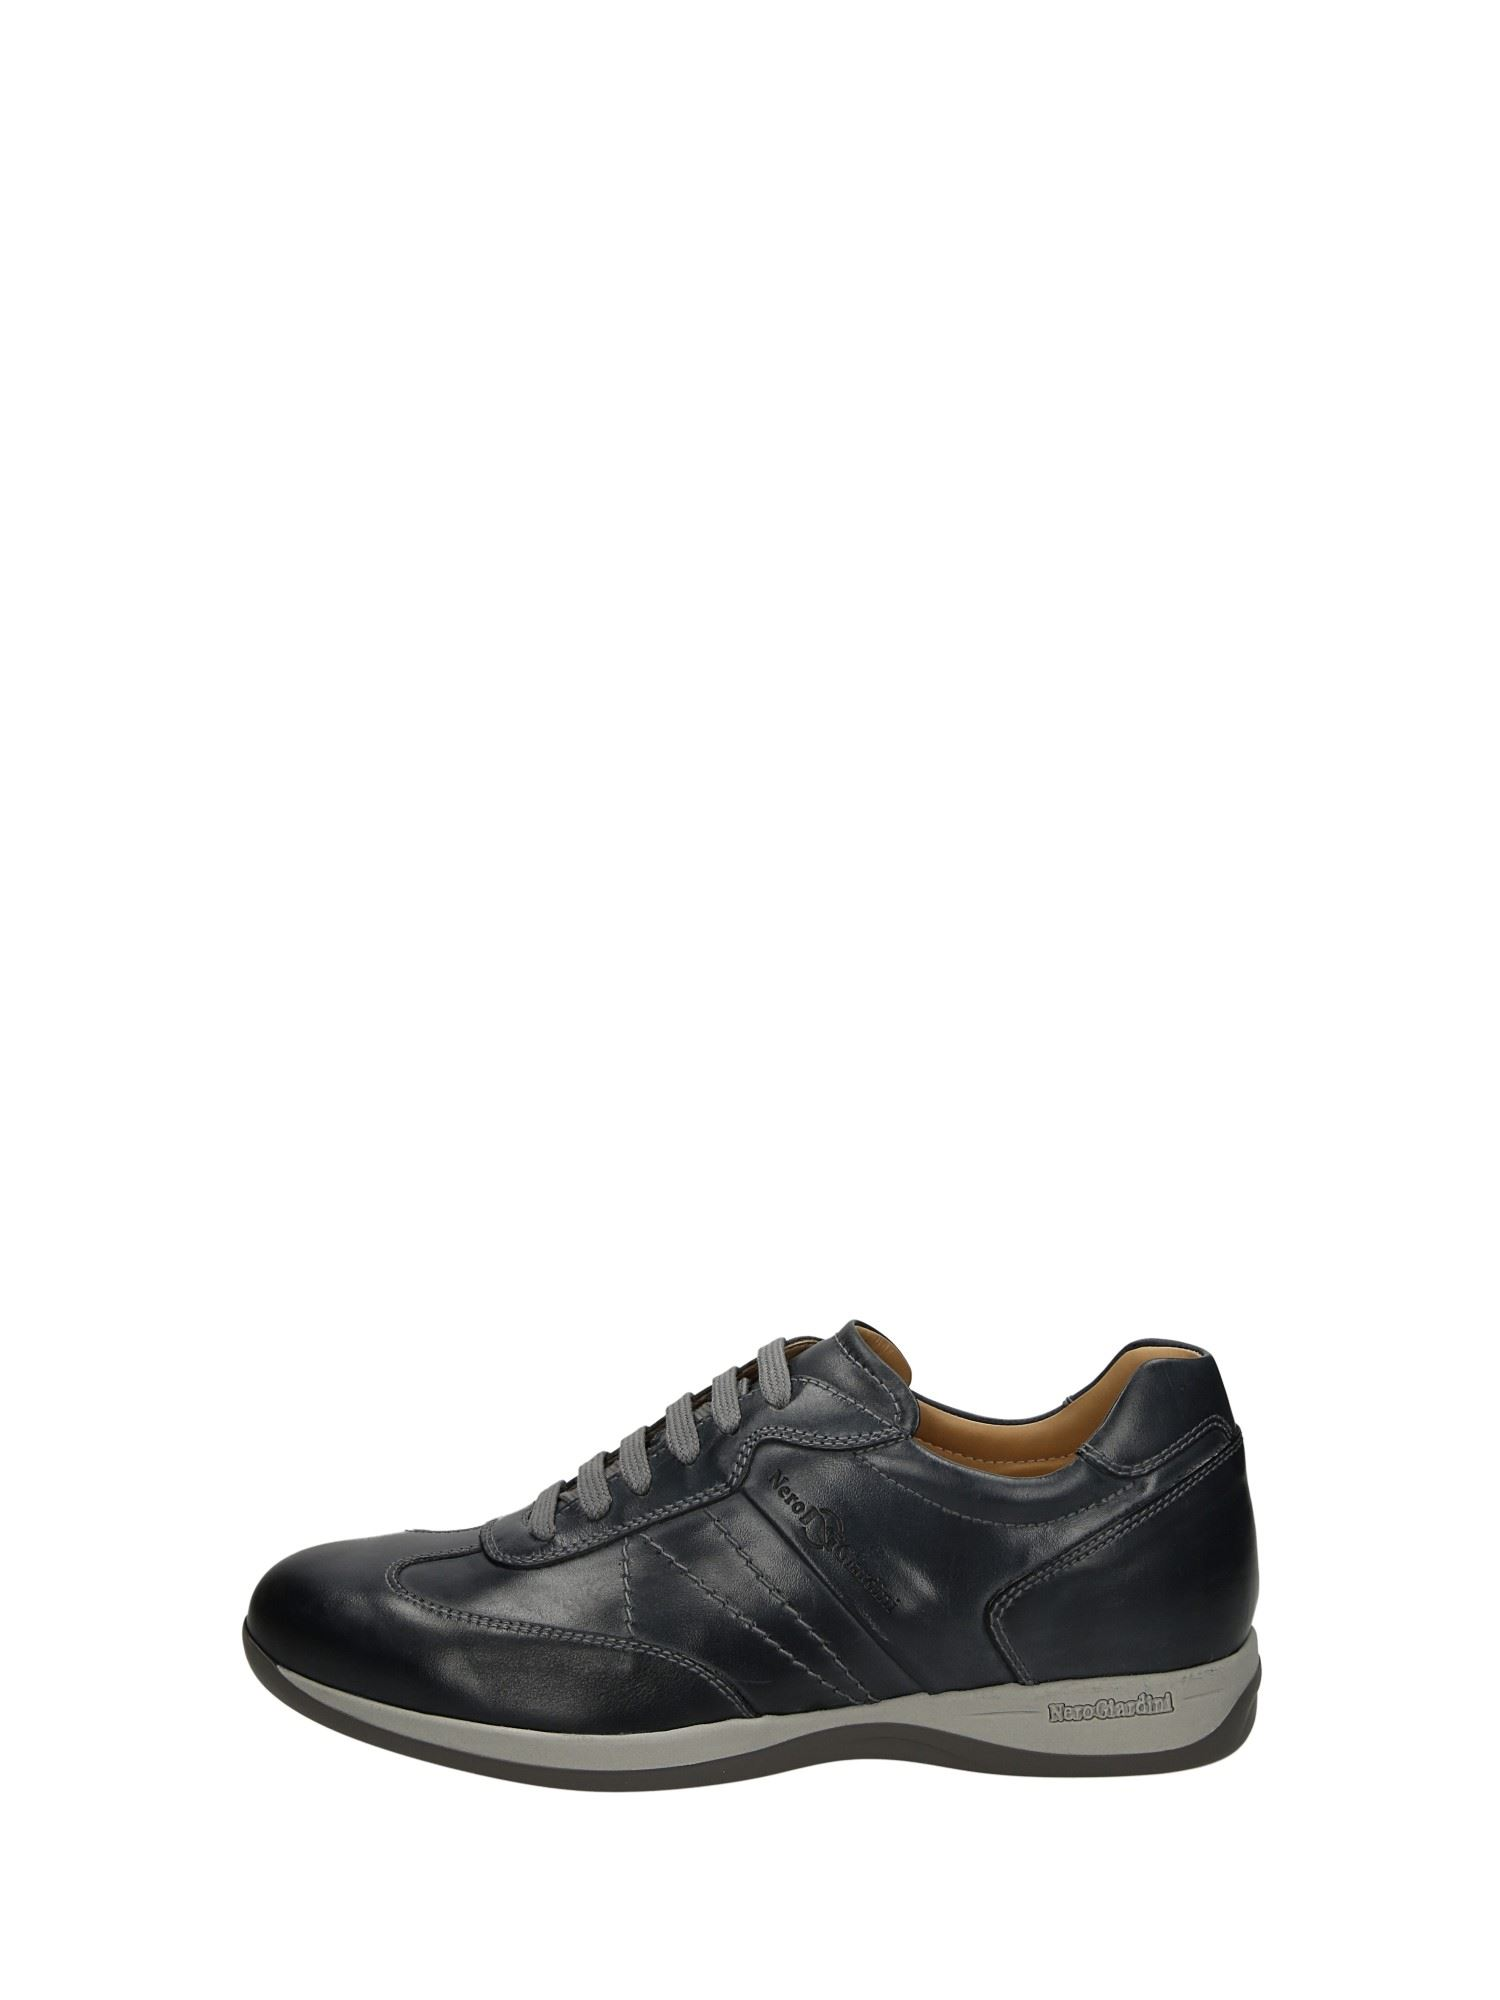 5dabfb878f Man Man Man Lalilina Low Nero Giardini Sneakers Blue wvqfxxRF6